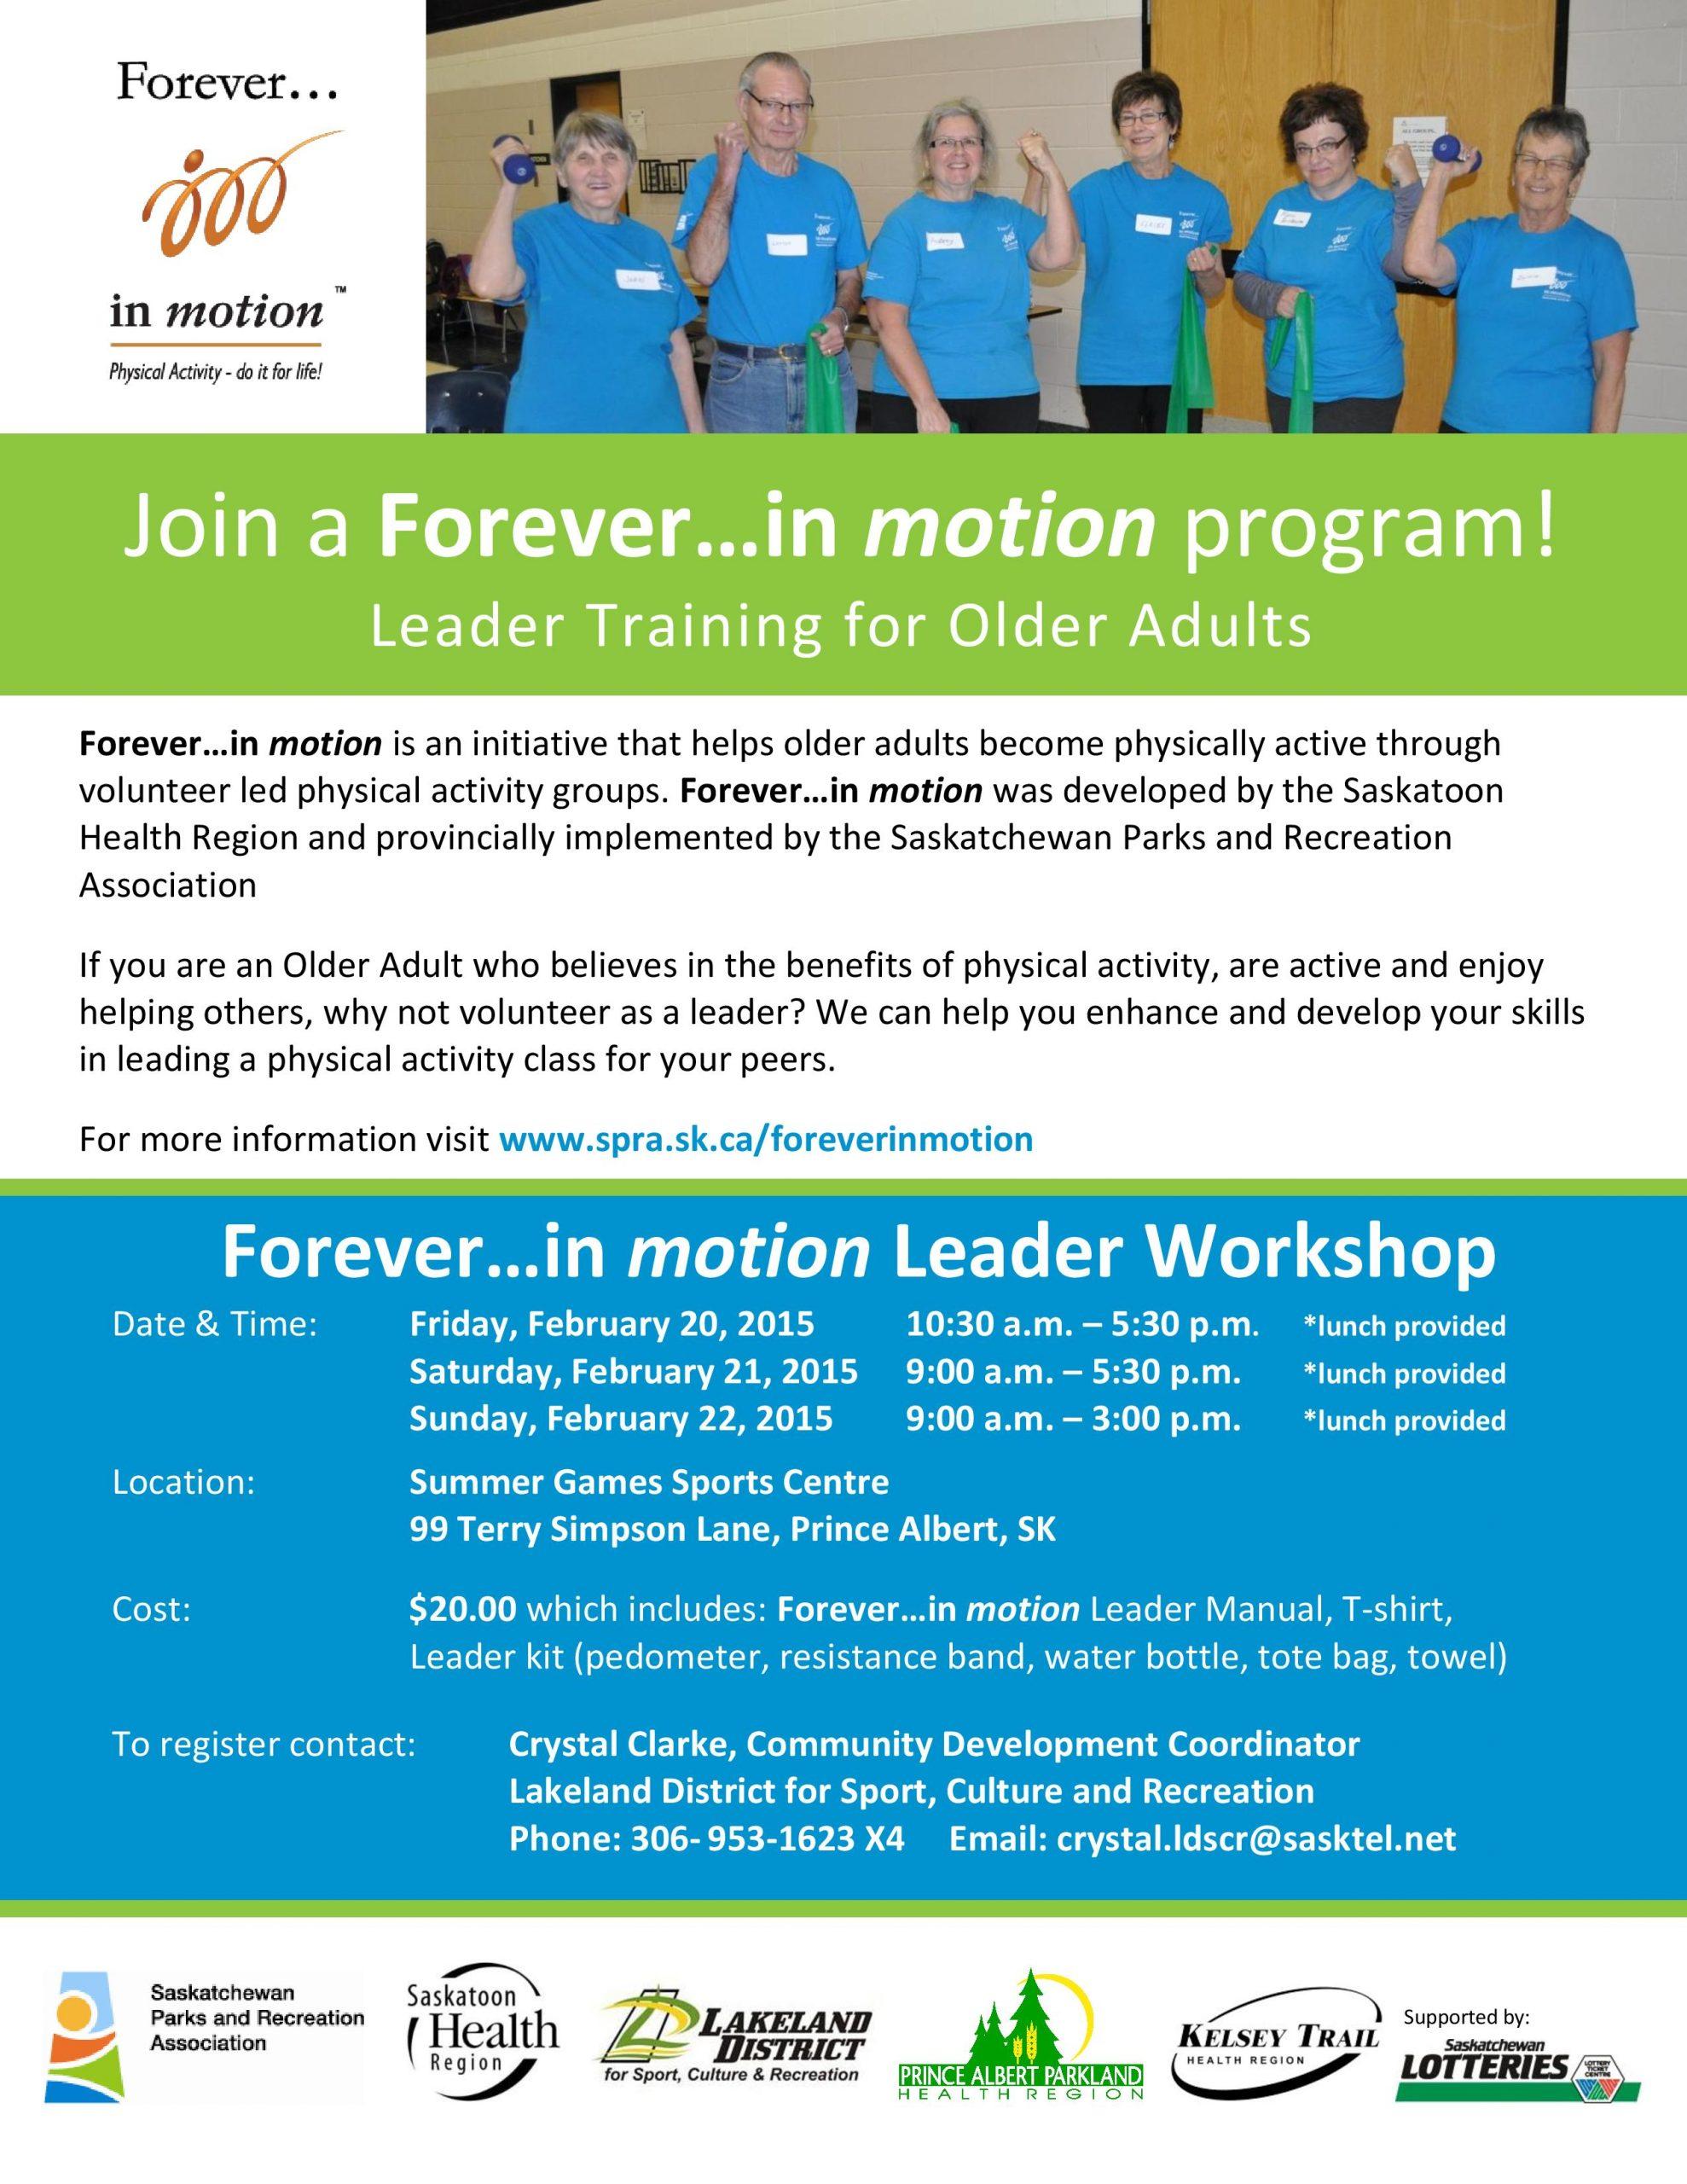 Forever in Motion | paNOW | Prince Albert, Saskatchewan